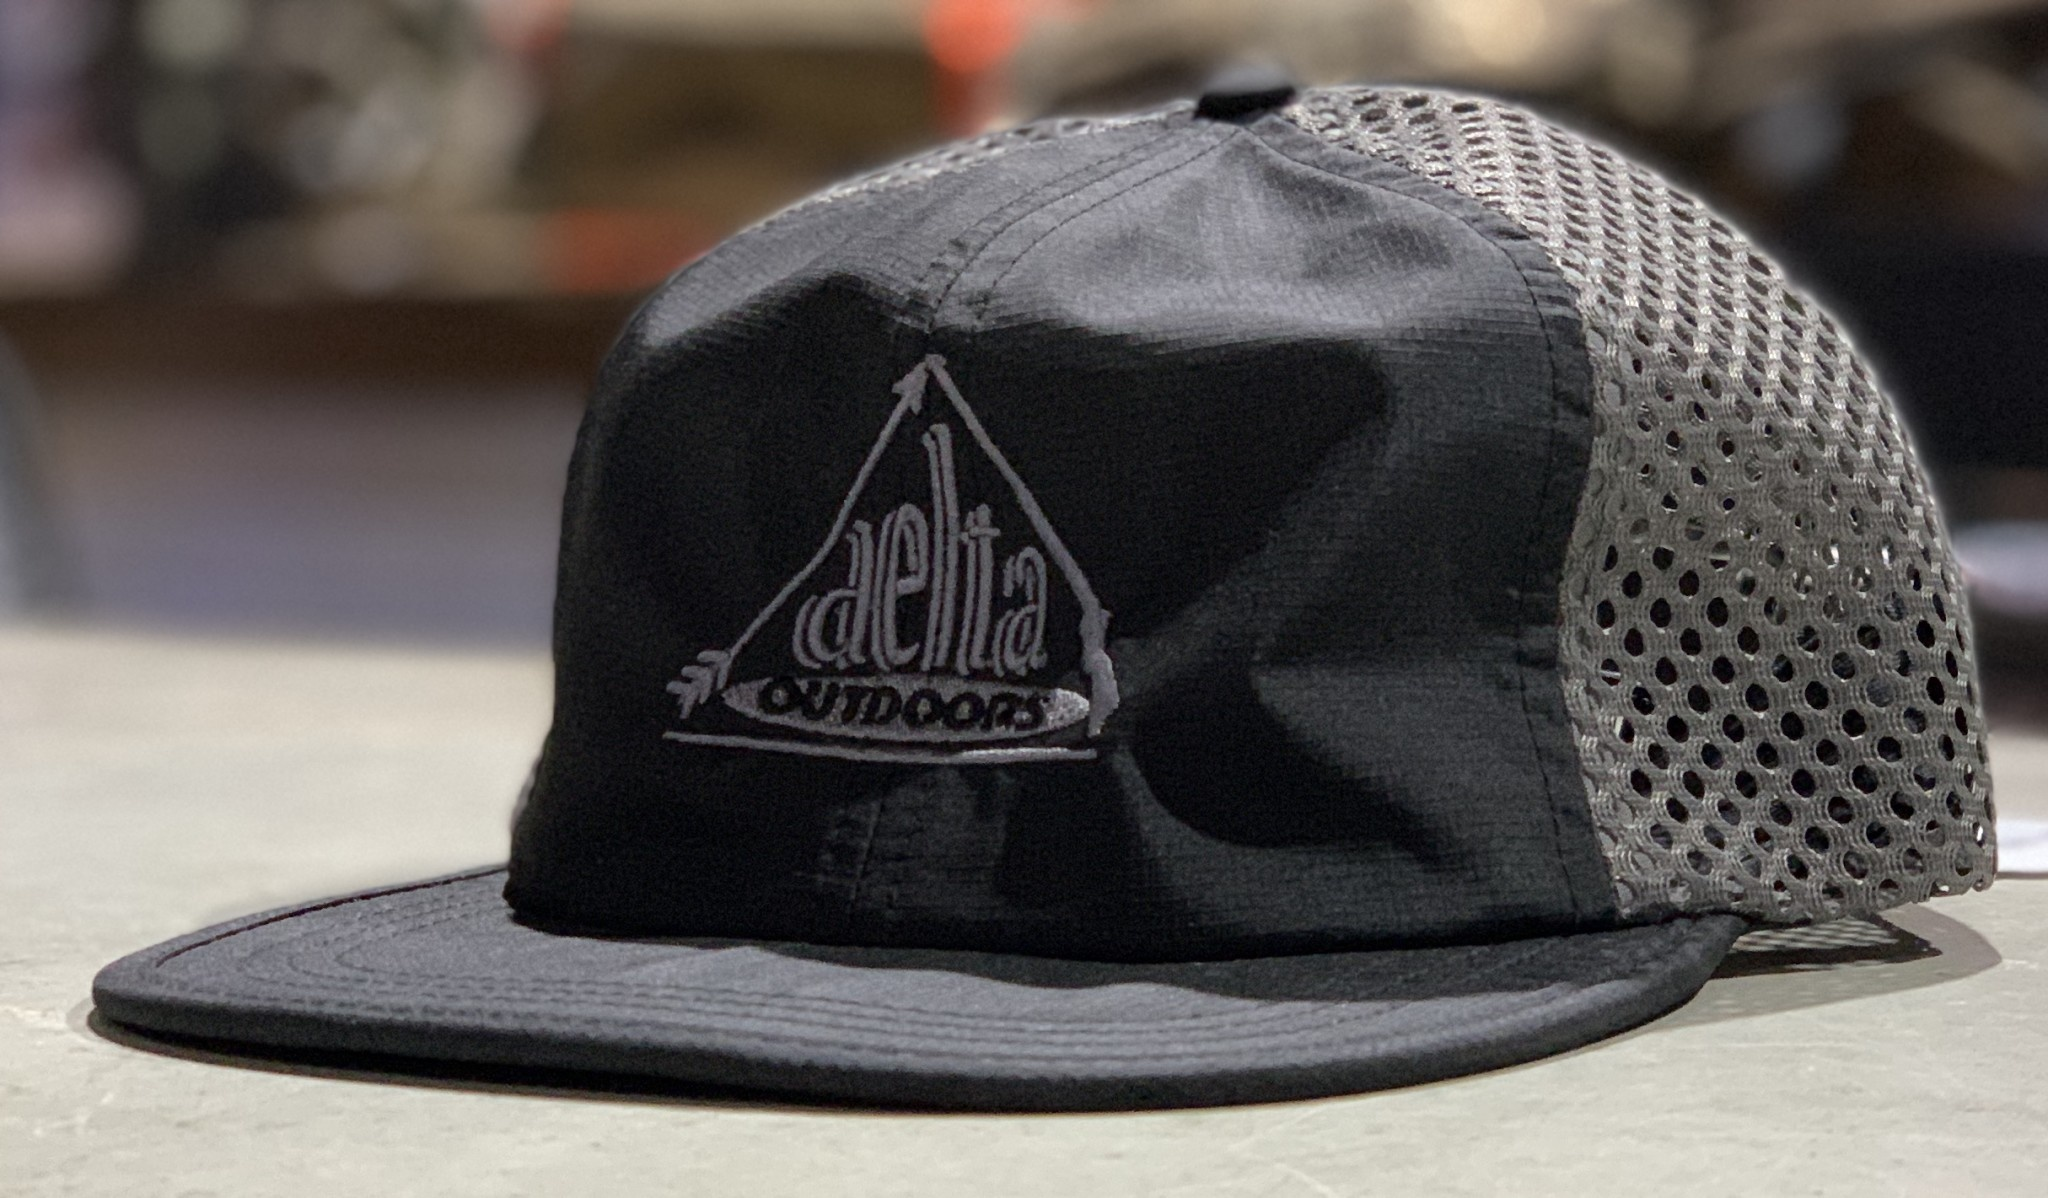 Delta Outdoors Crushable Black/Gray Cap-1